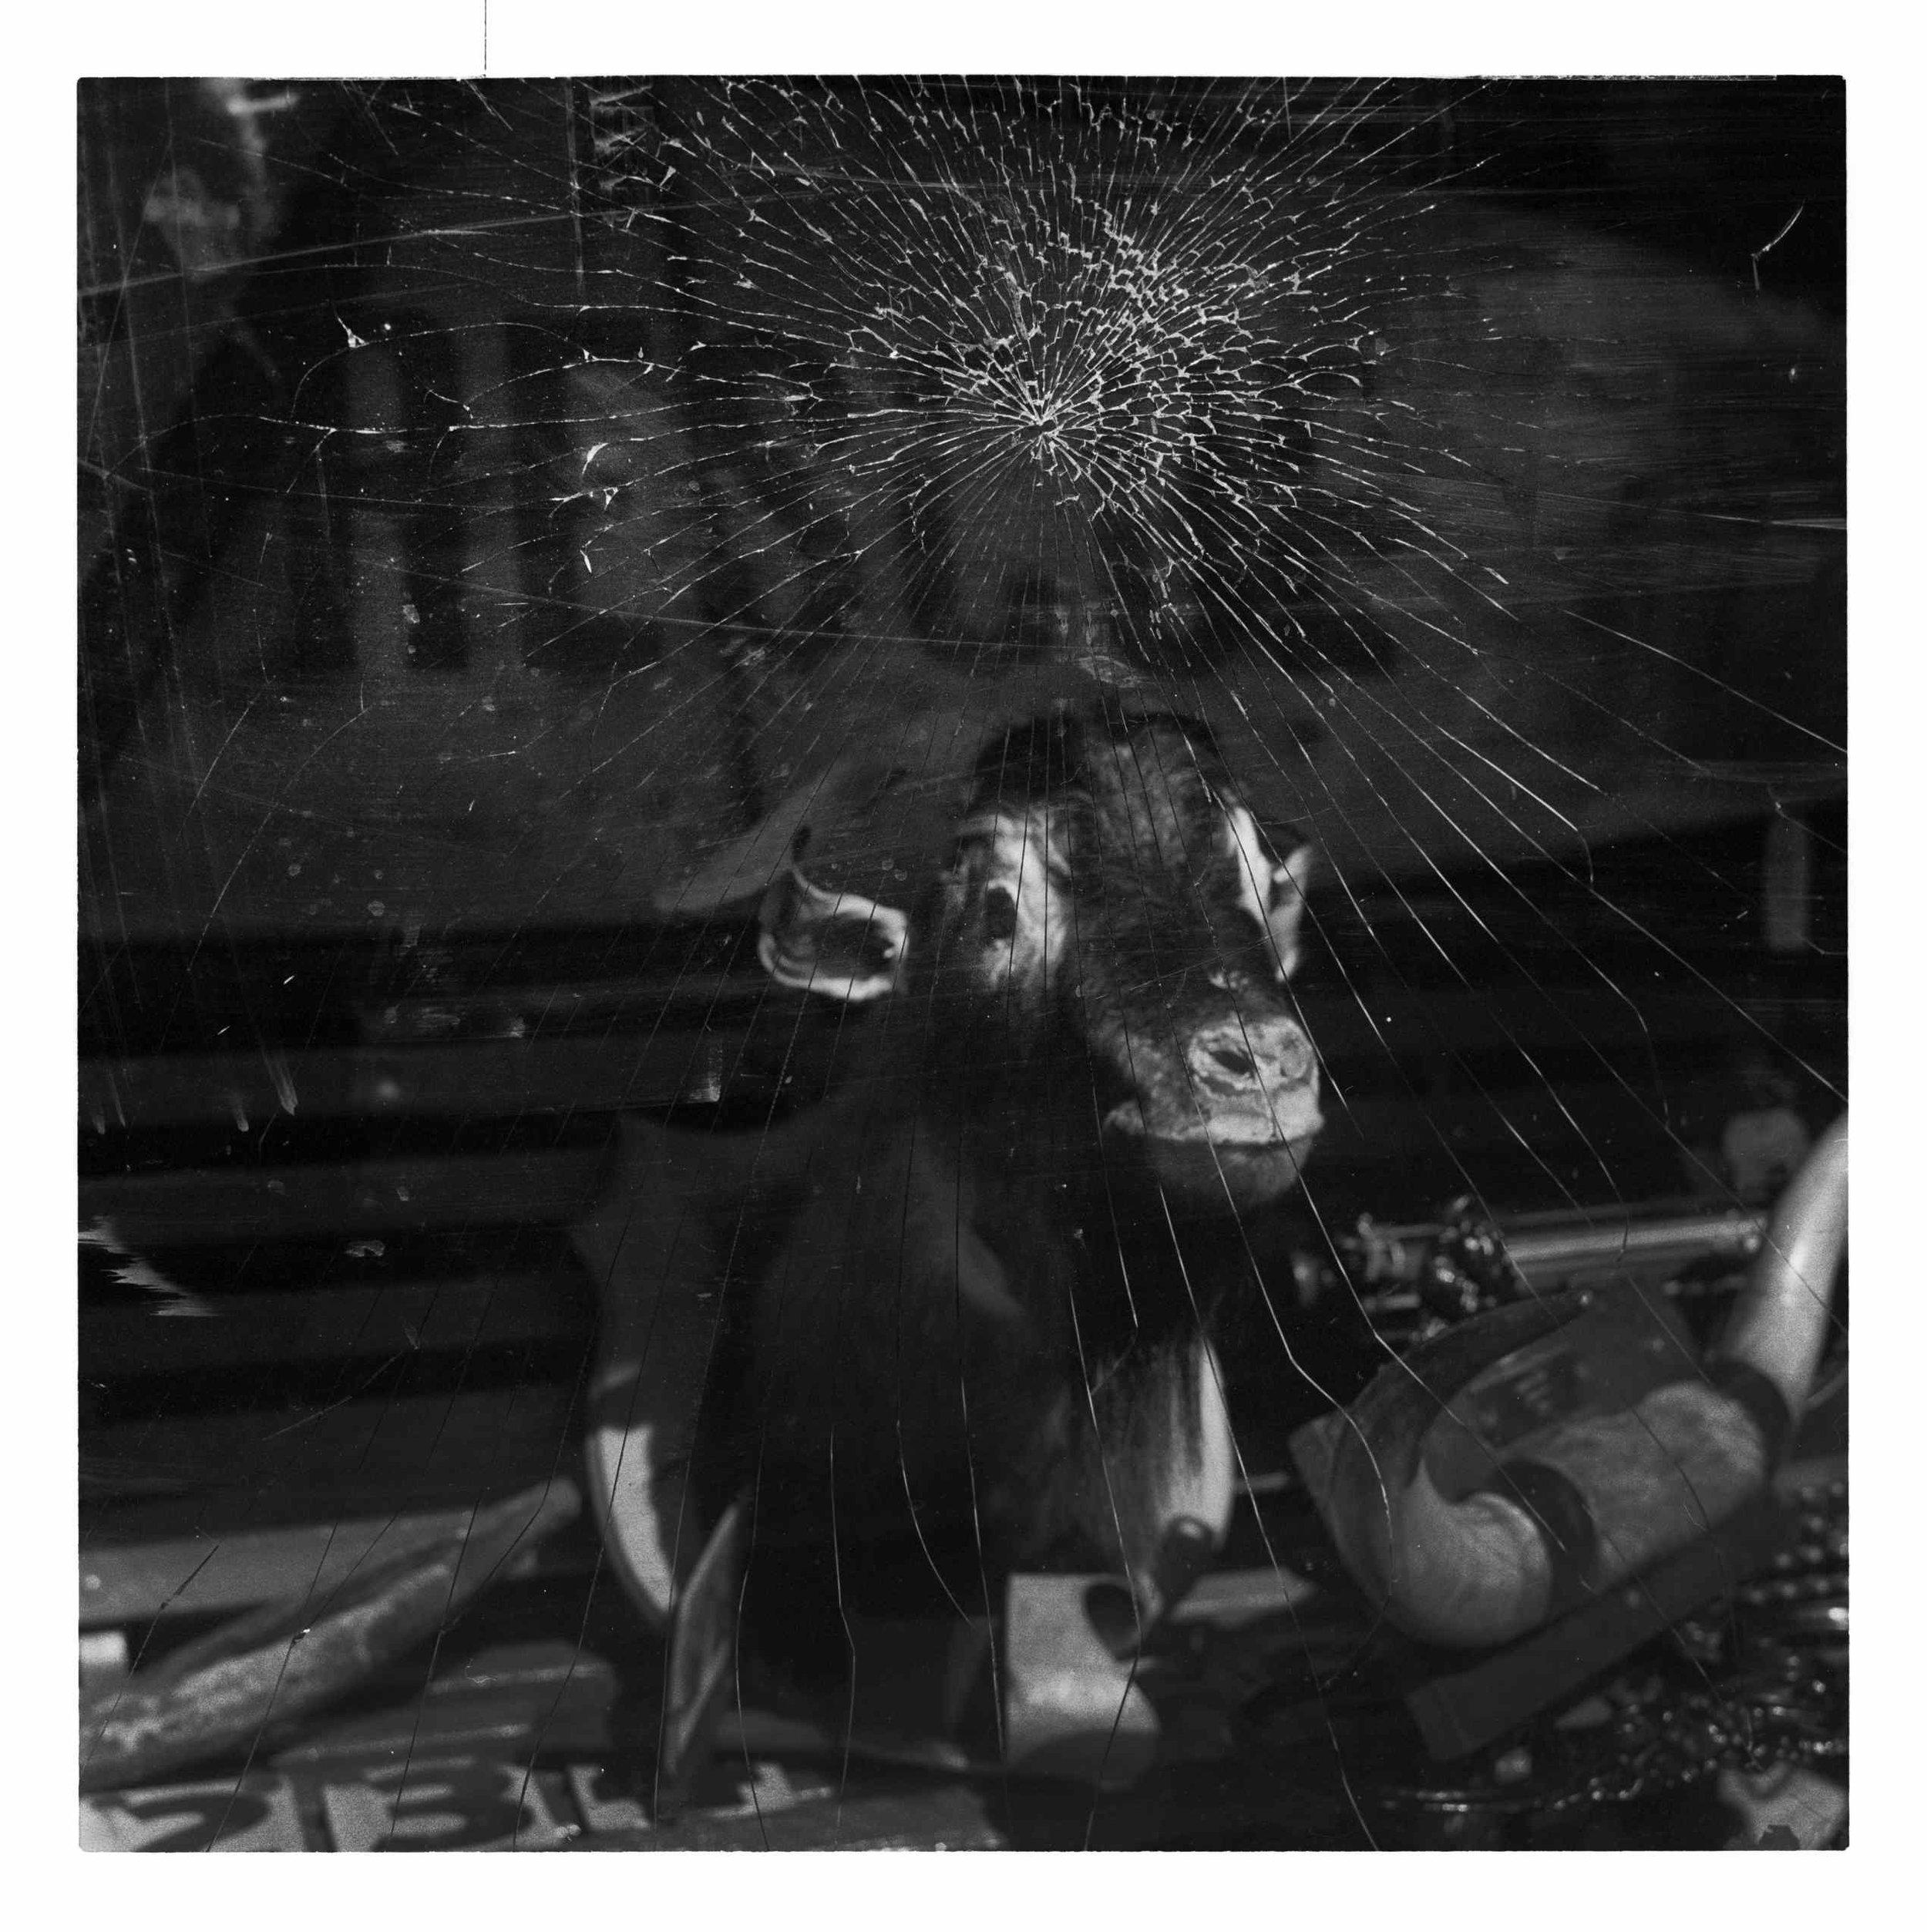 """Cow In The Window"" King Street, Newtown. Sydney, Australia. 2013"